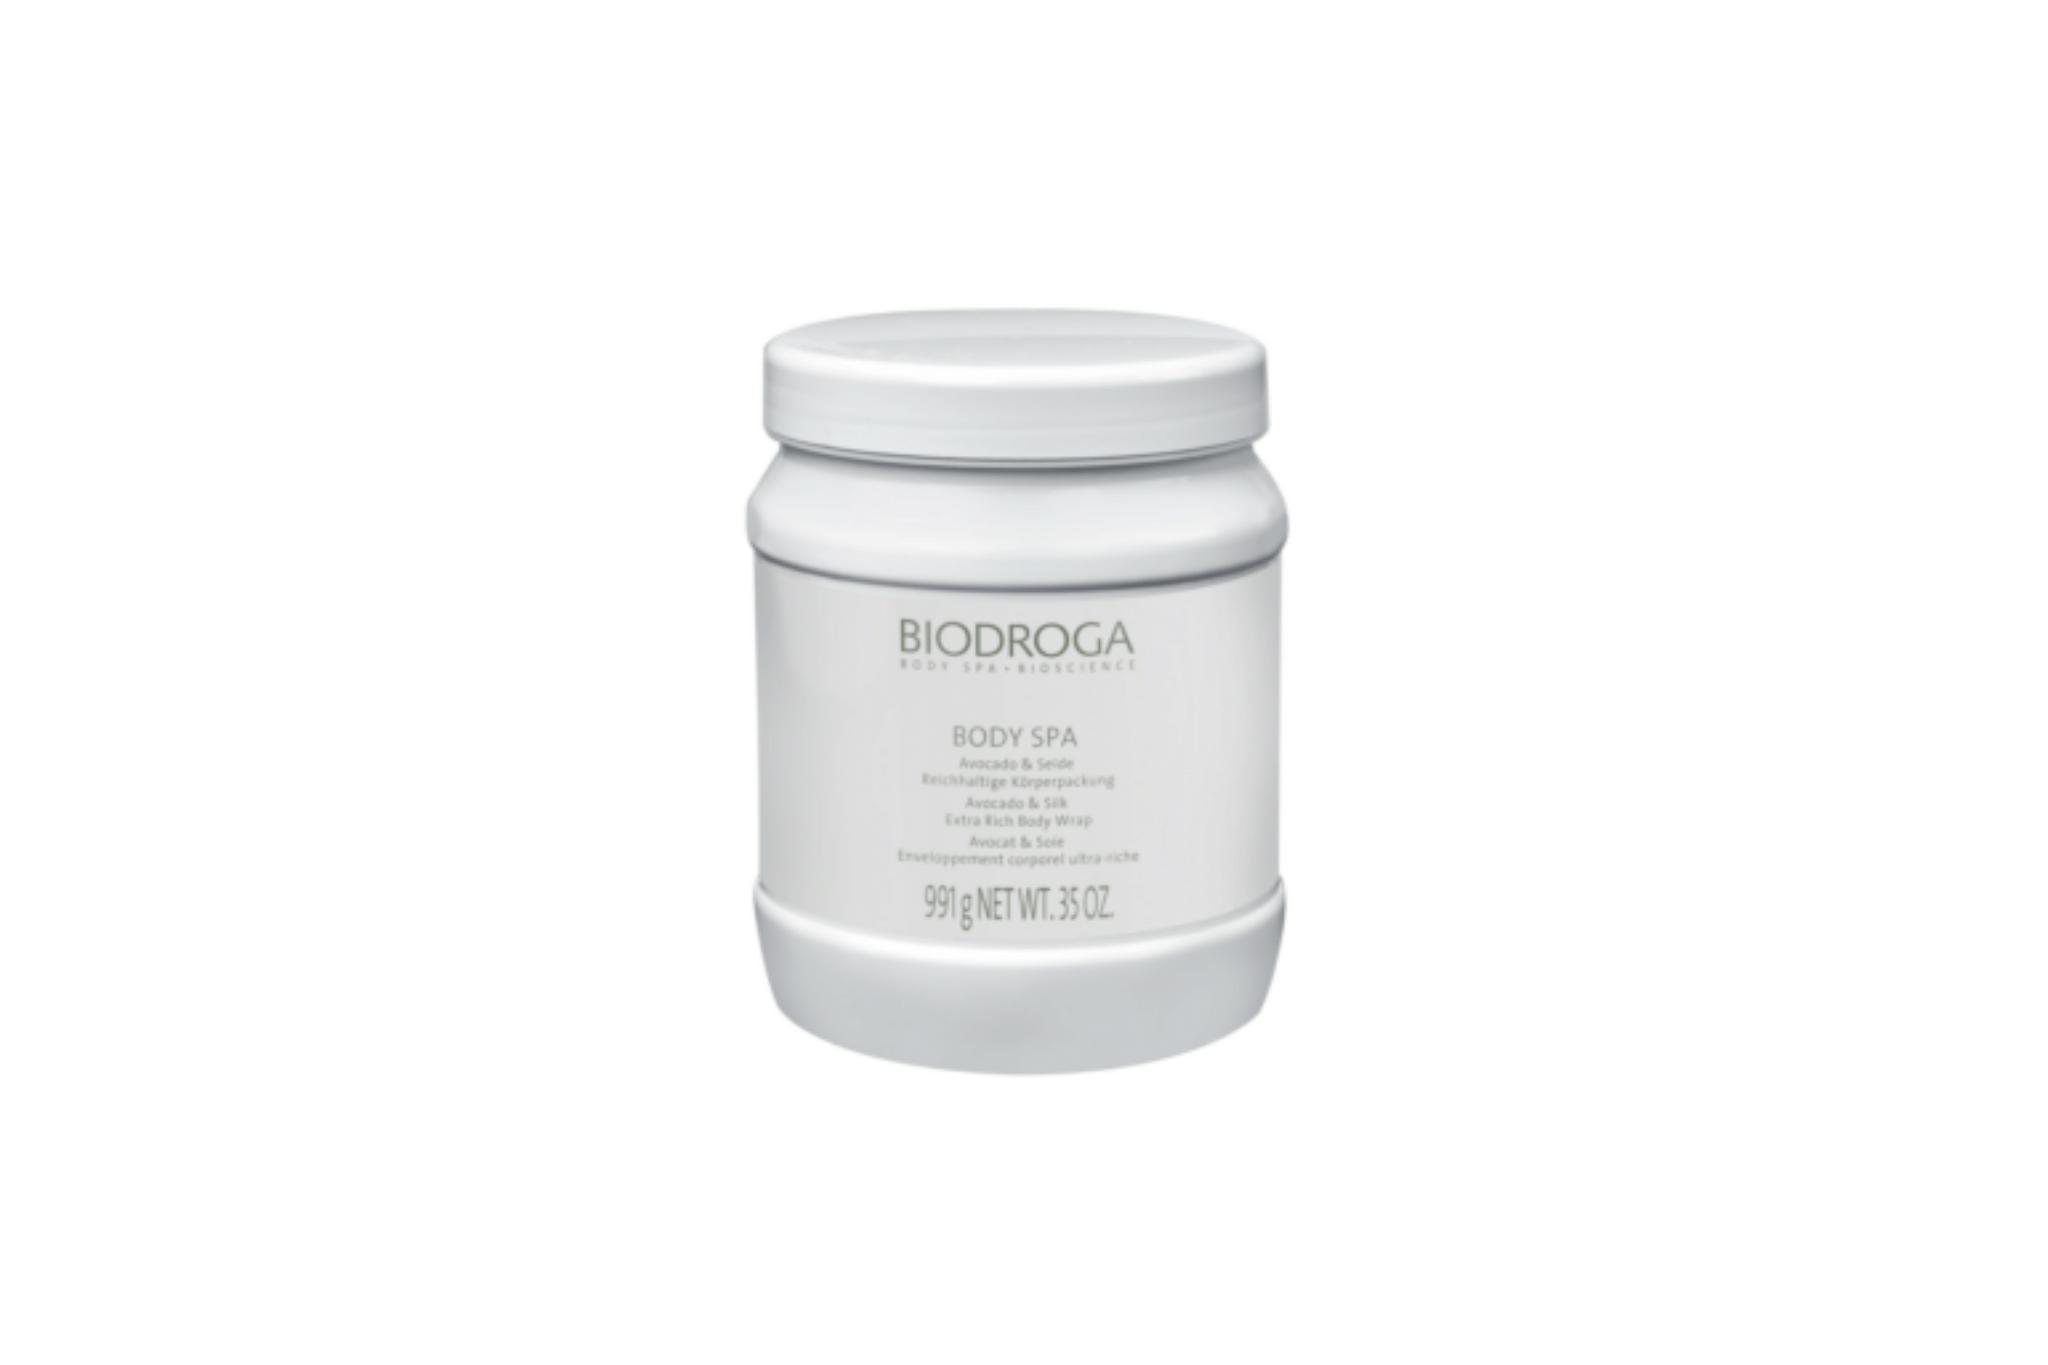 biodroga professional body products